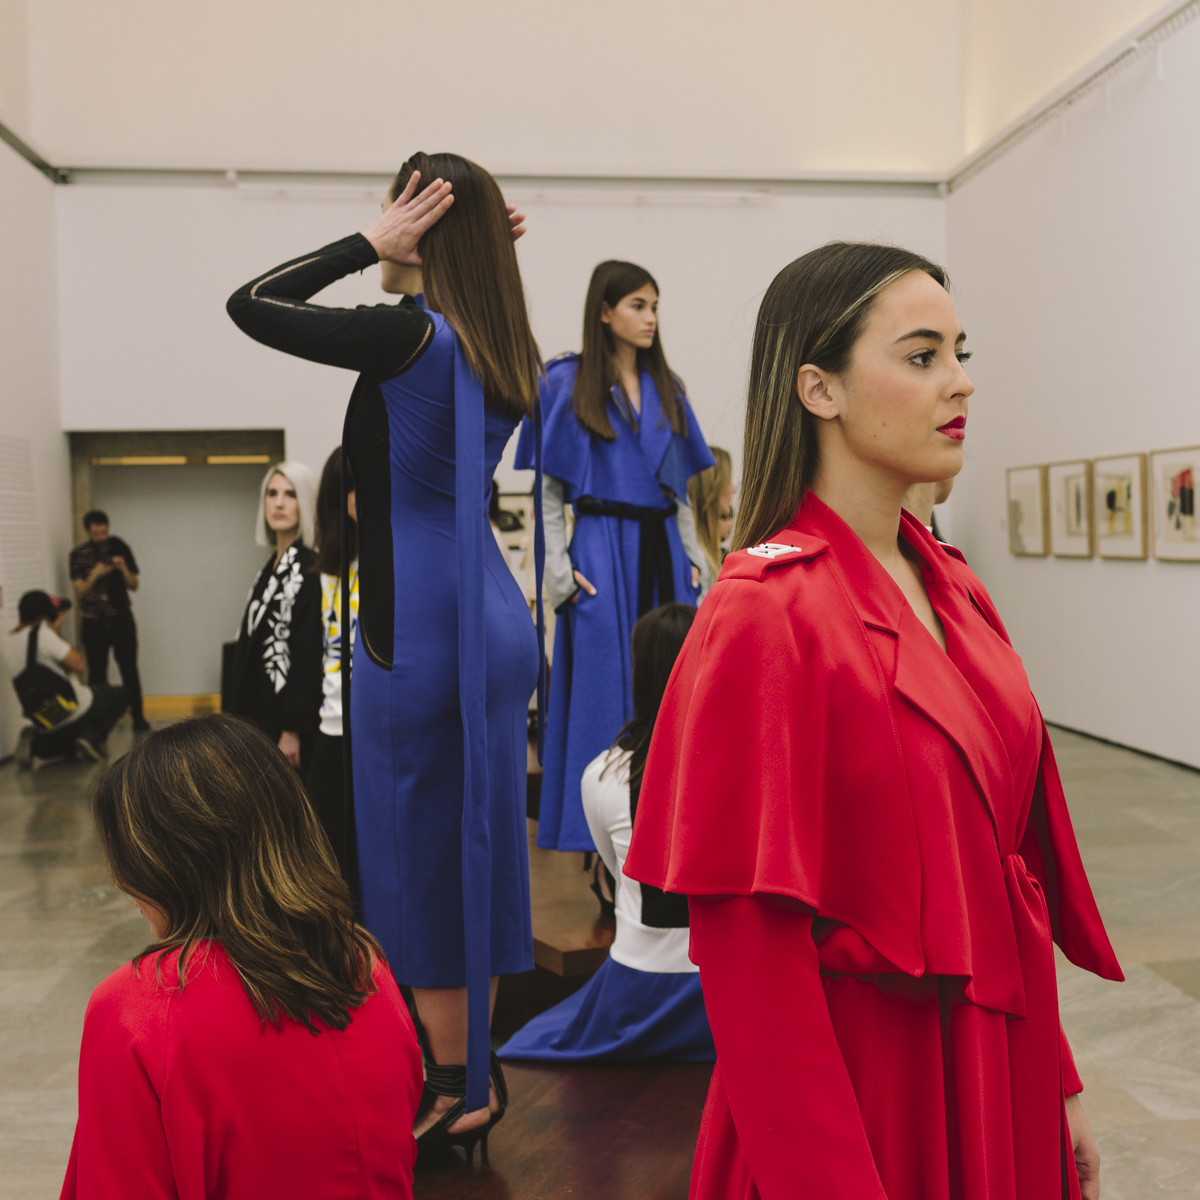 La Brecha - Pilar Dalbat - Showroom-Joseangelfoto-003.jpg